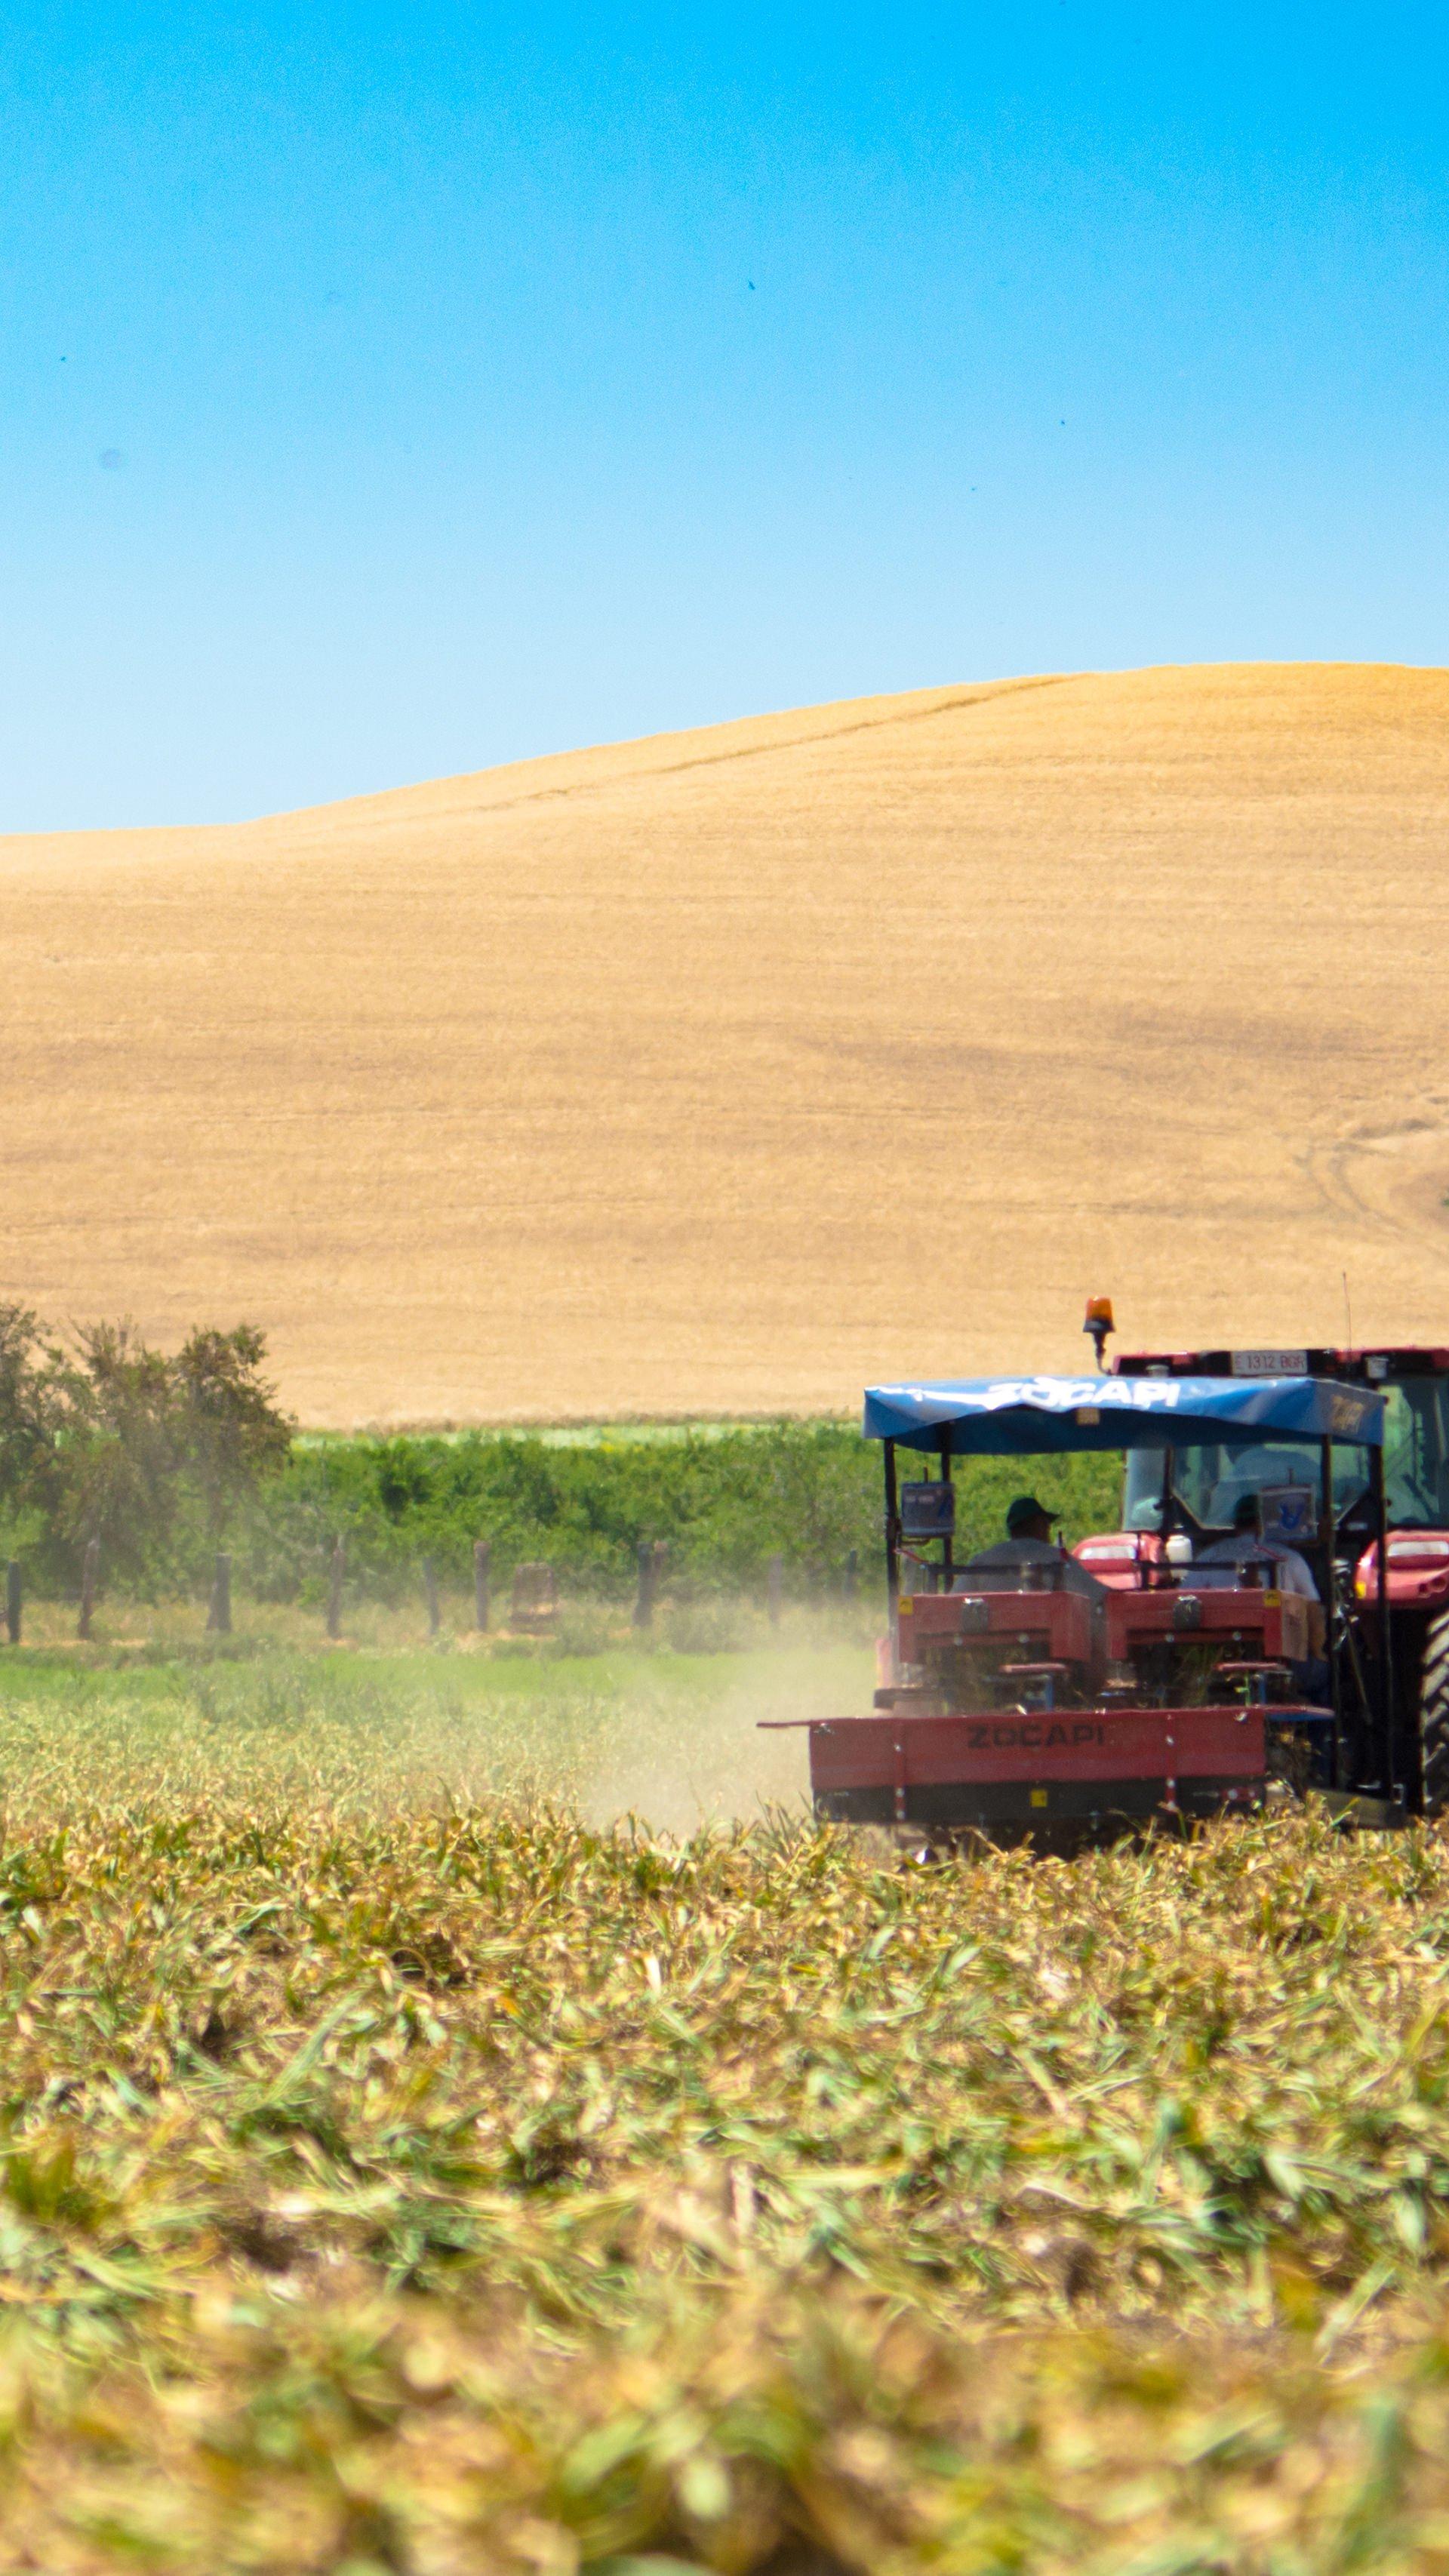 Campo de cultivo de ajo